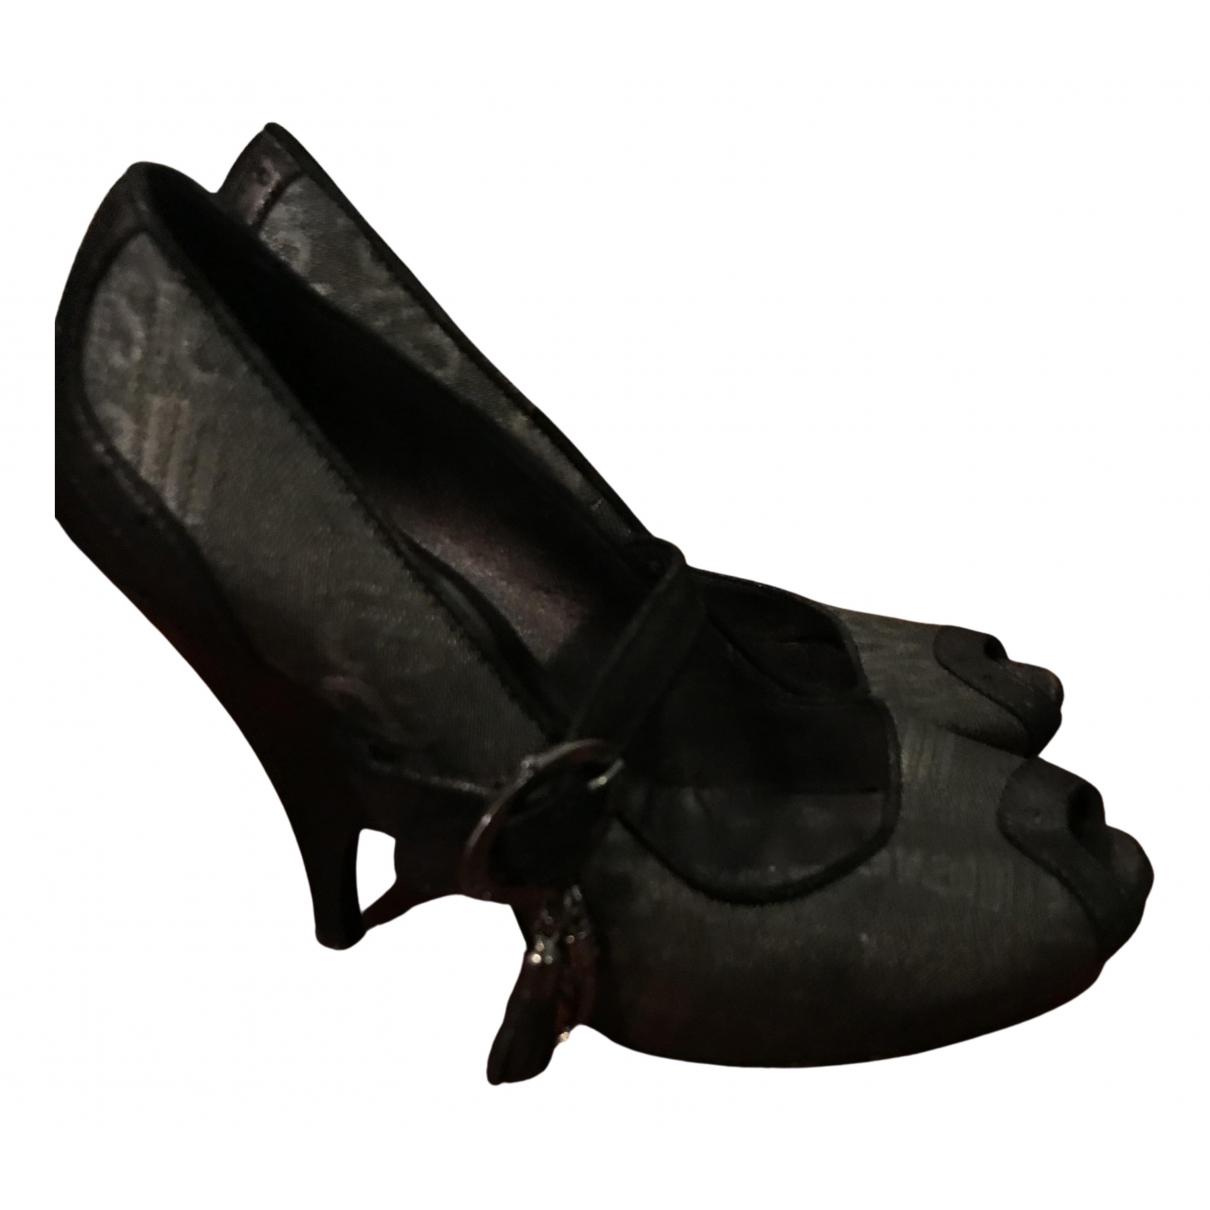 Roberto Cavalli N Grey Cloth Heels for Women 38 EU